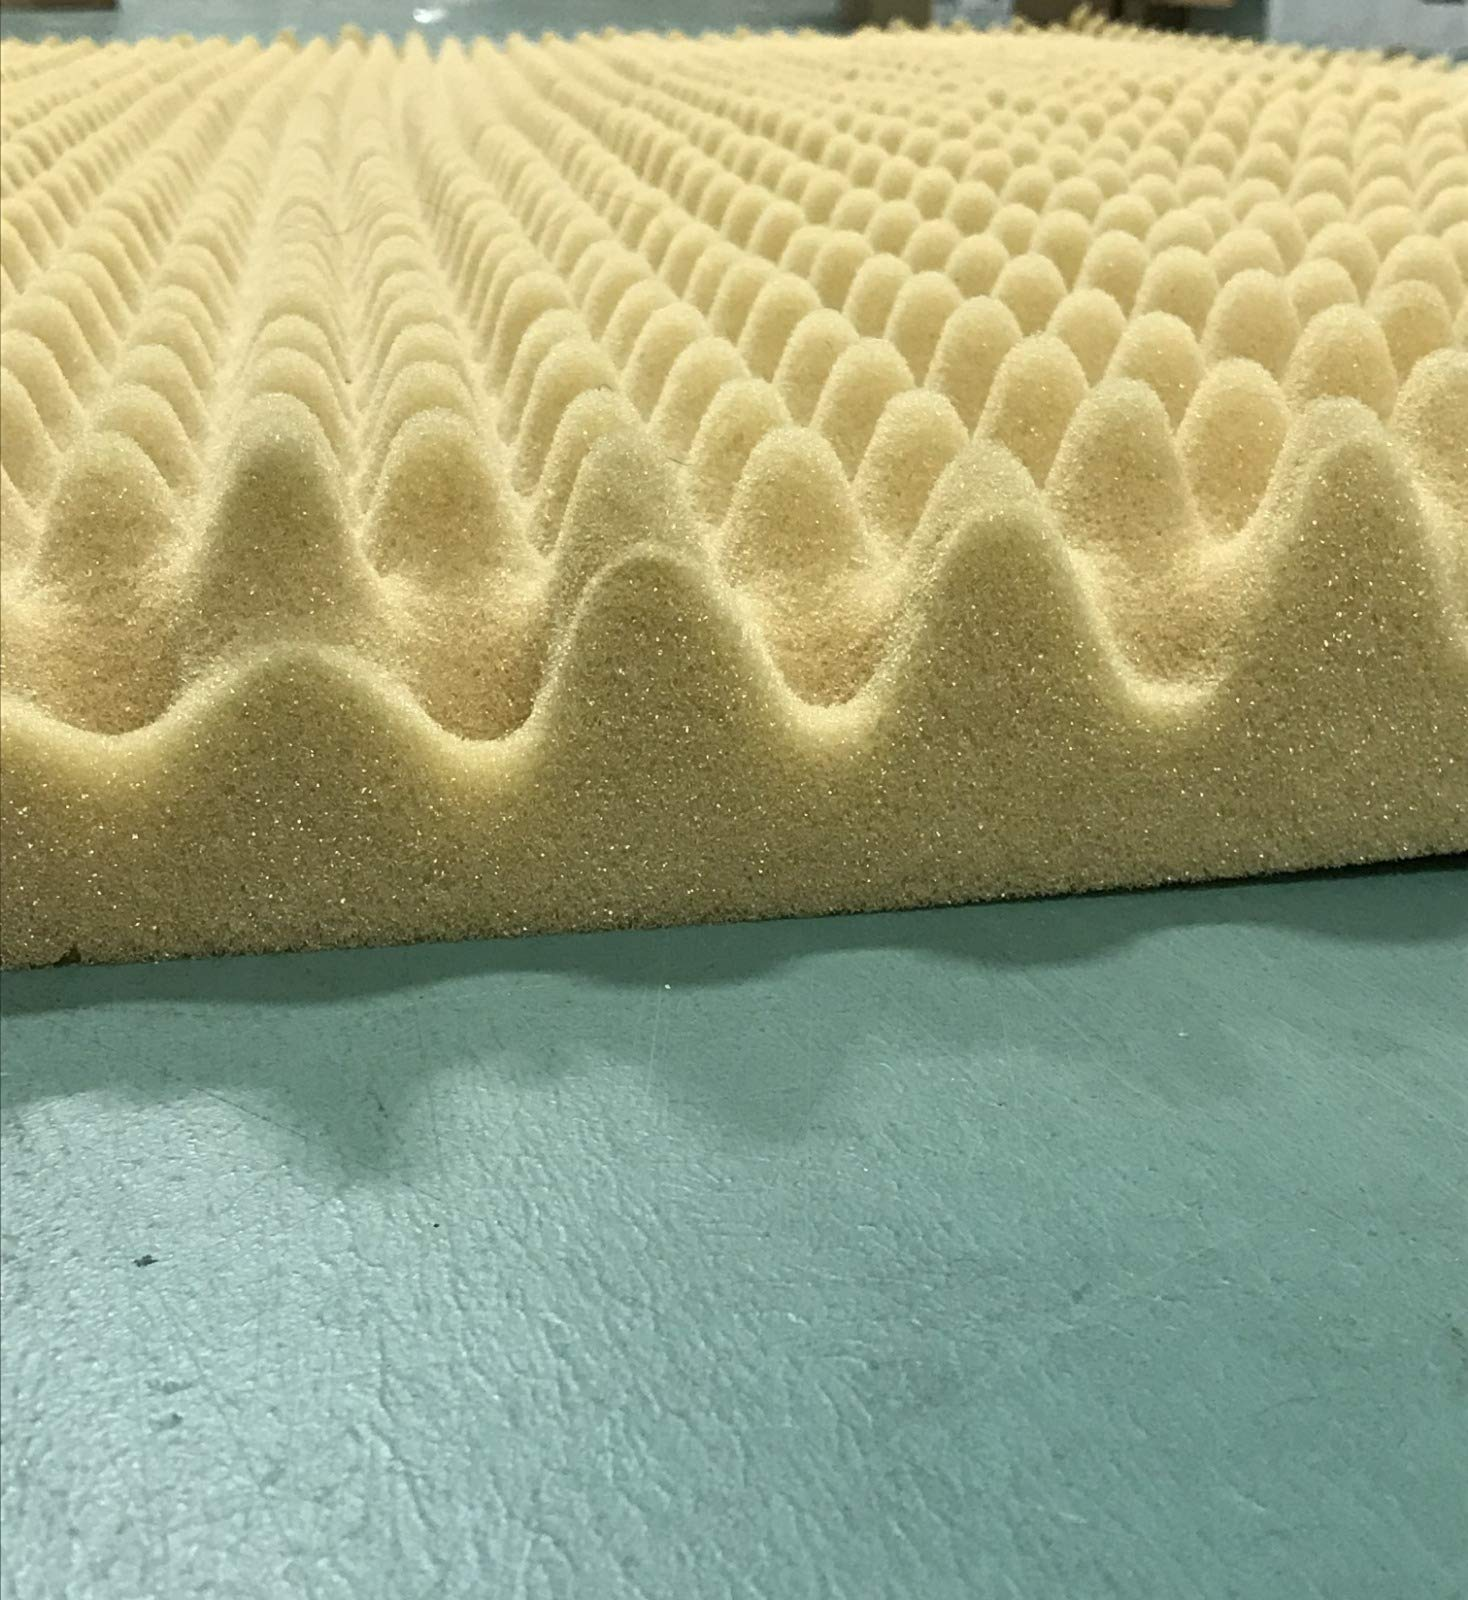 Egg Crate Convoluted 3 Inch Foam Mattress Pad / Topper ...